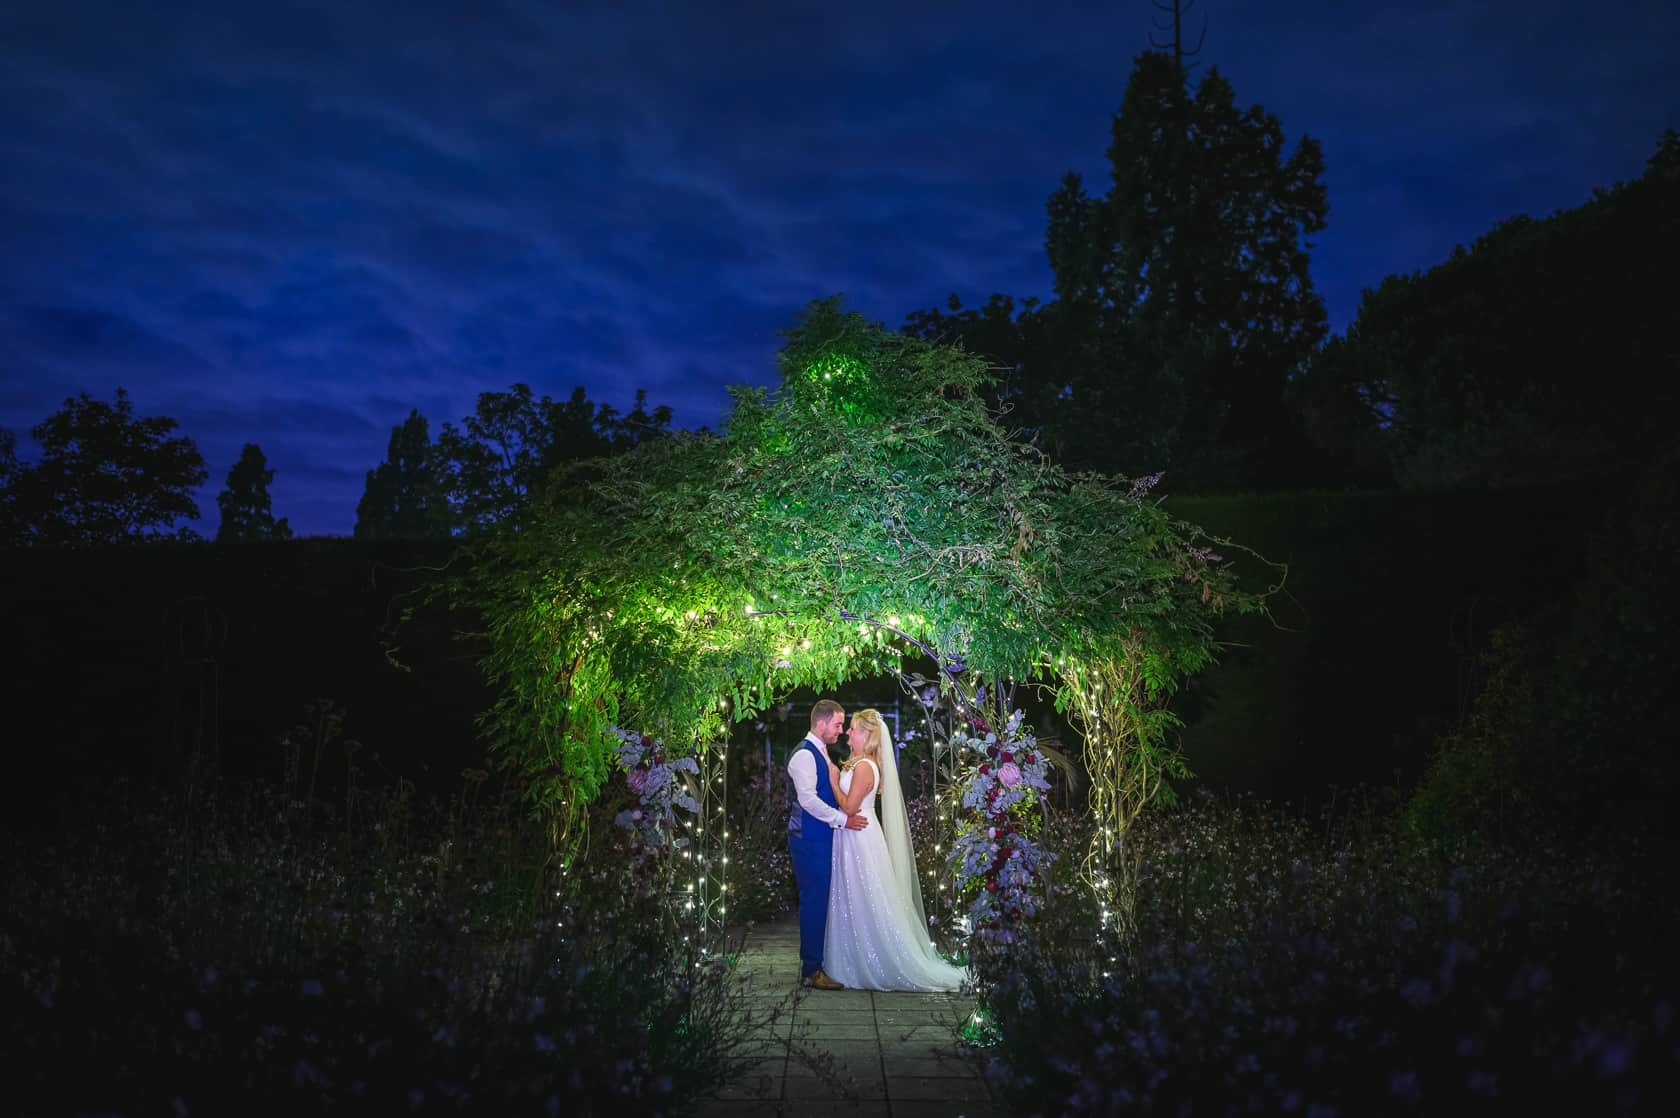 Best_Wedding_Photography_2019_Wedding-Photographer-Essex_030